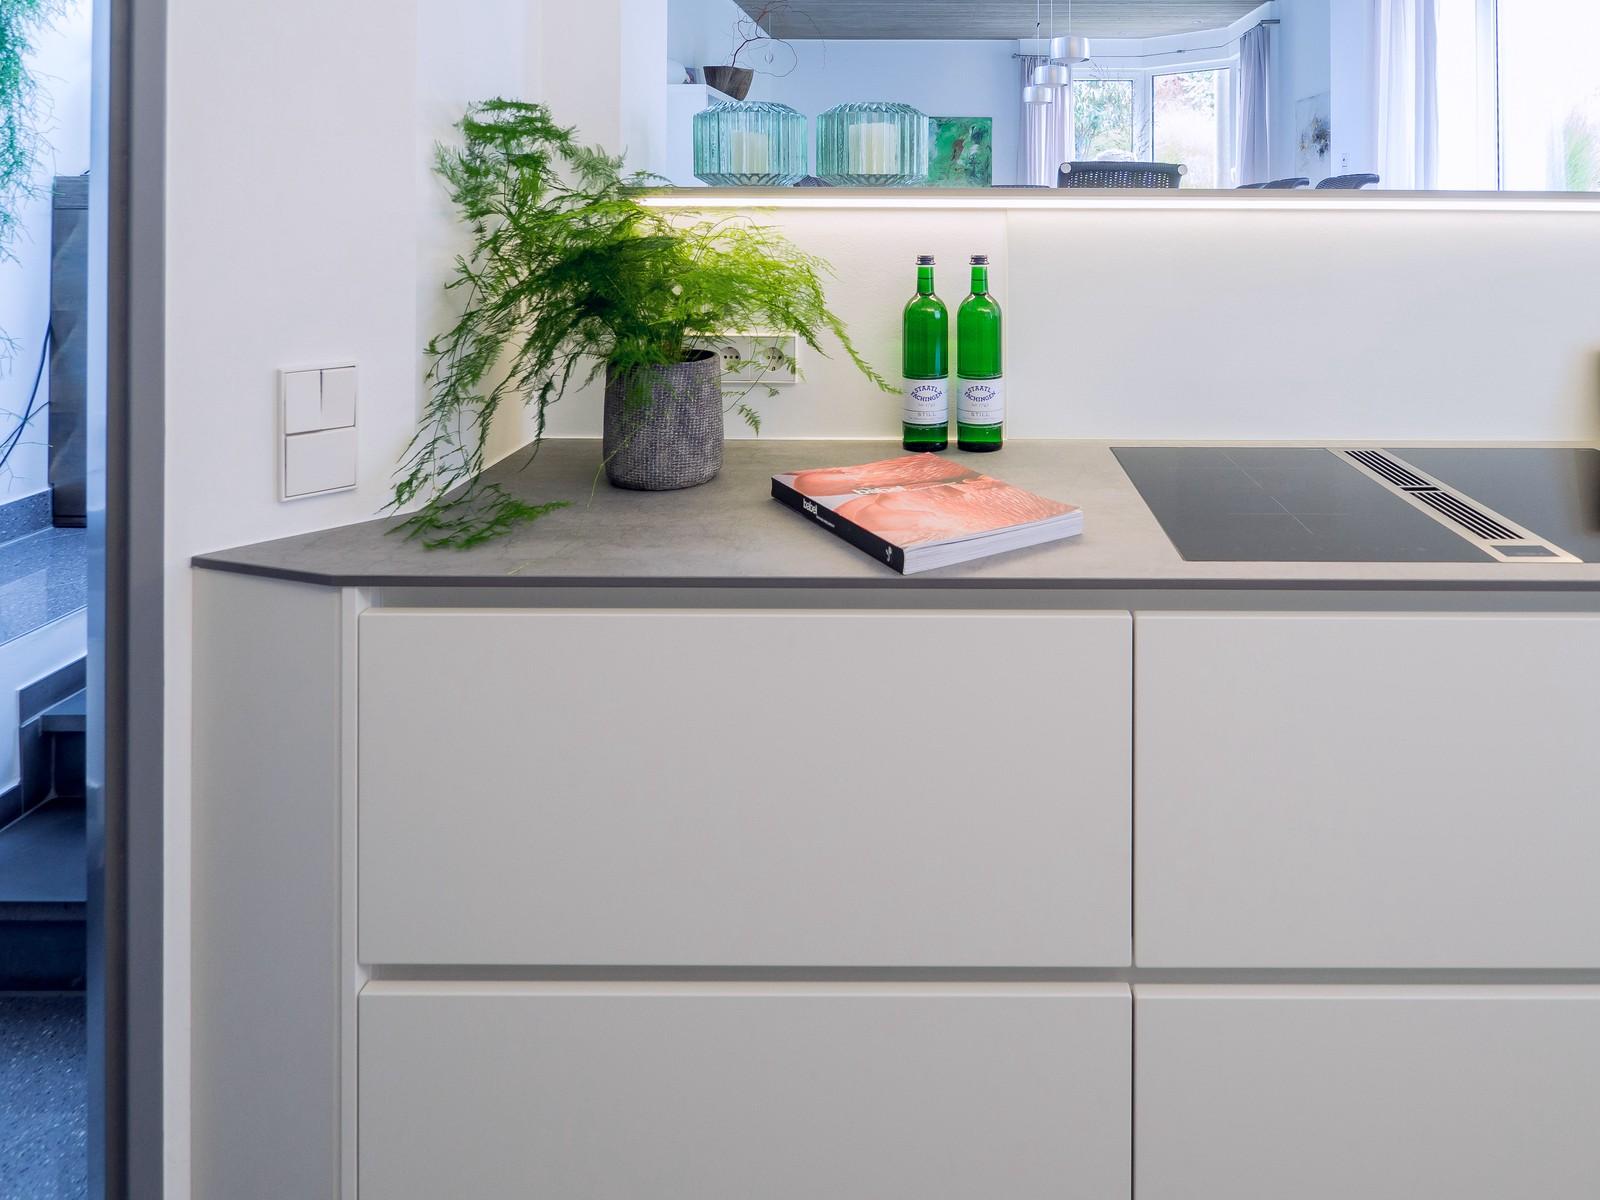 Helle Grifflose Kueche Lack Matt Weiss Keramikarbeitsplatte Miele Elektrogeraeten Bora Classic Muldenluefter 14